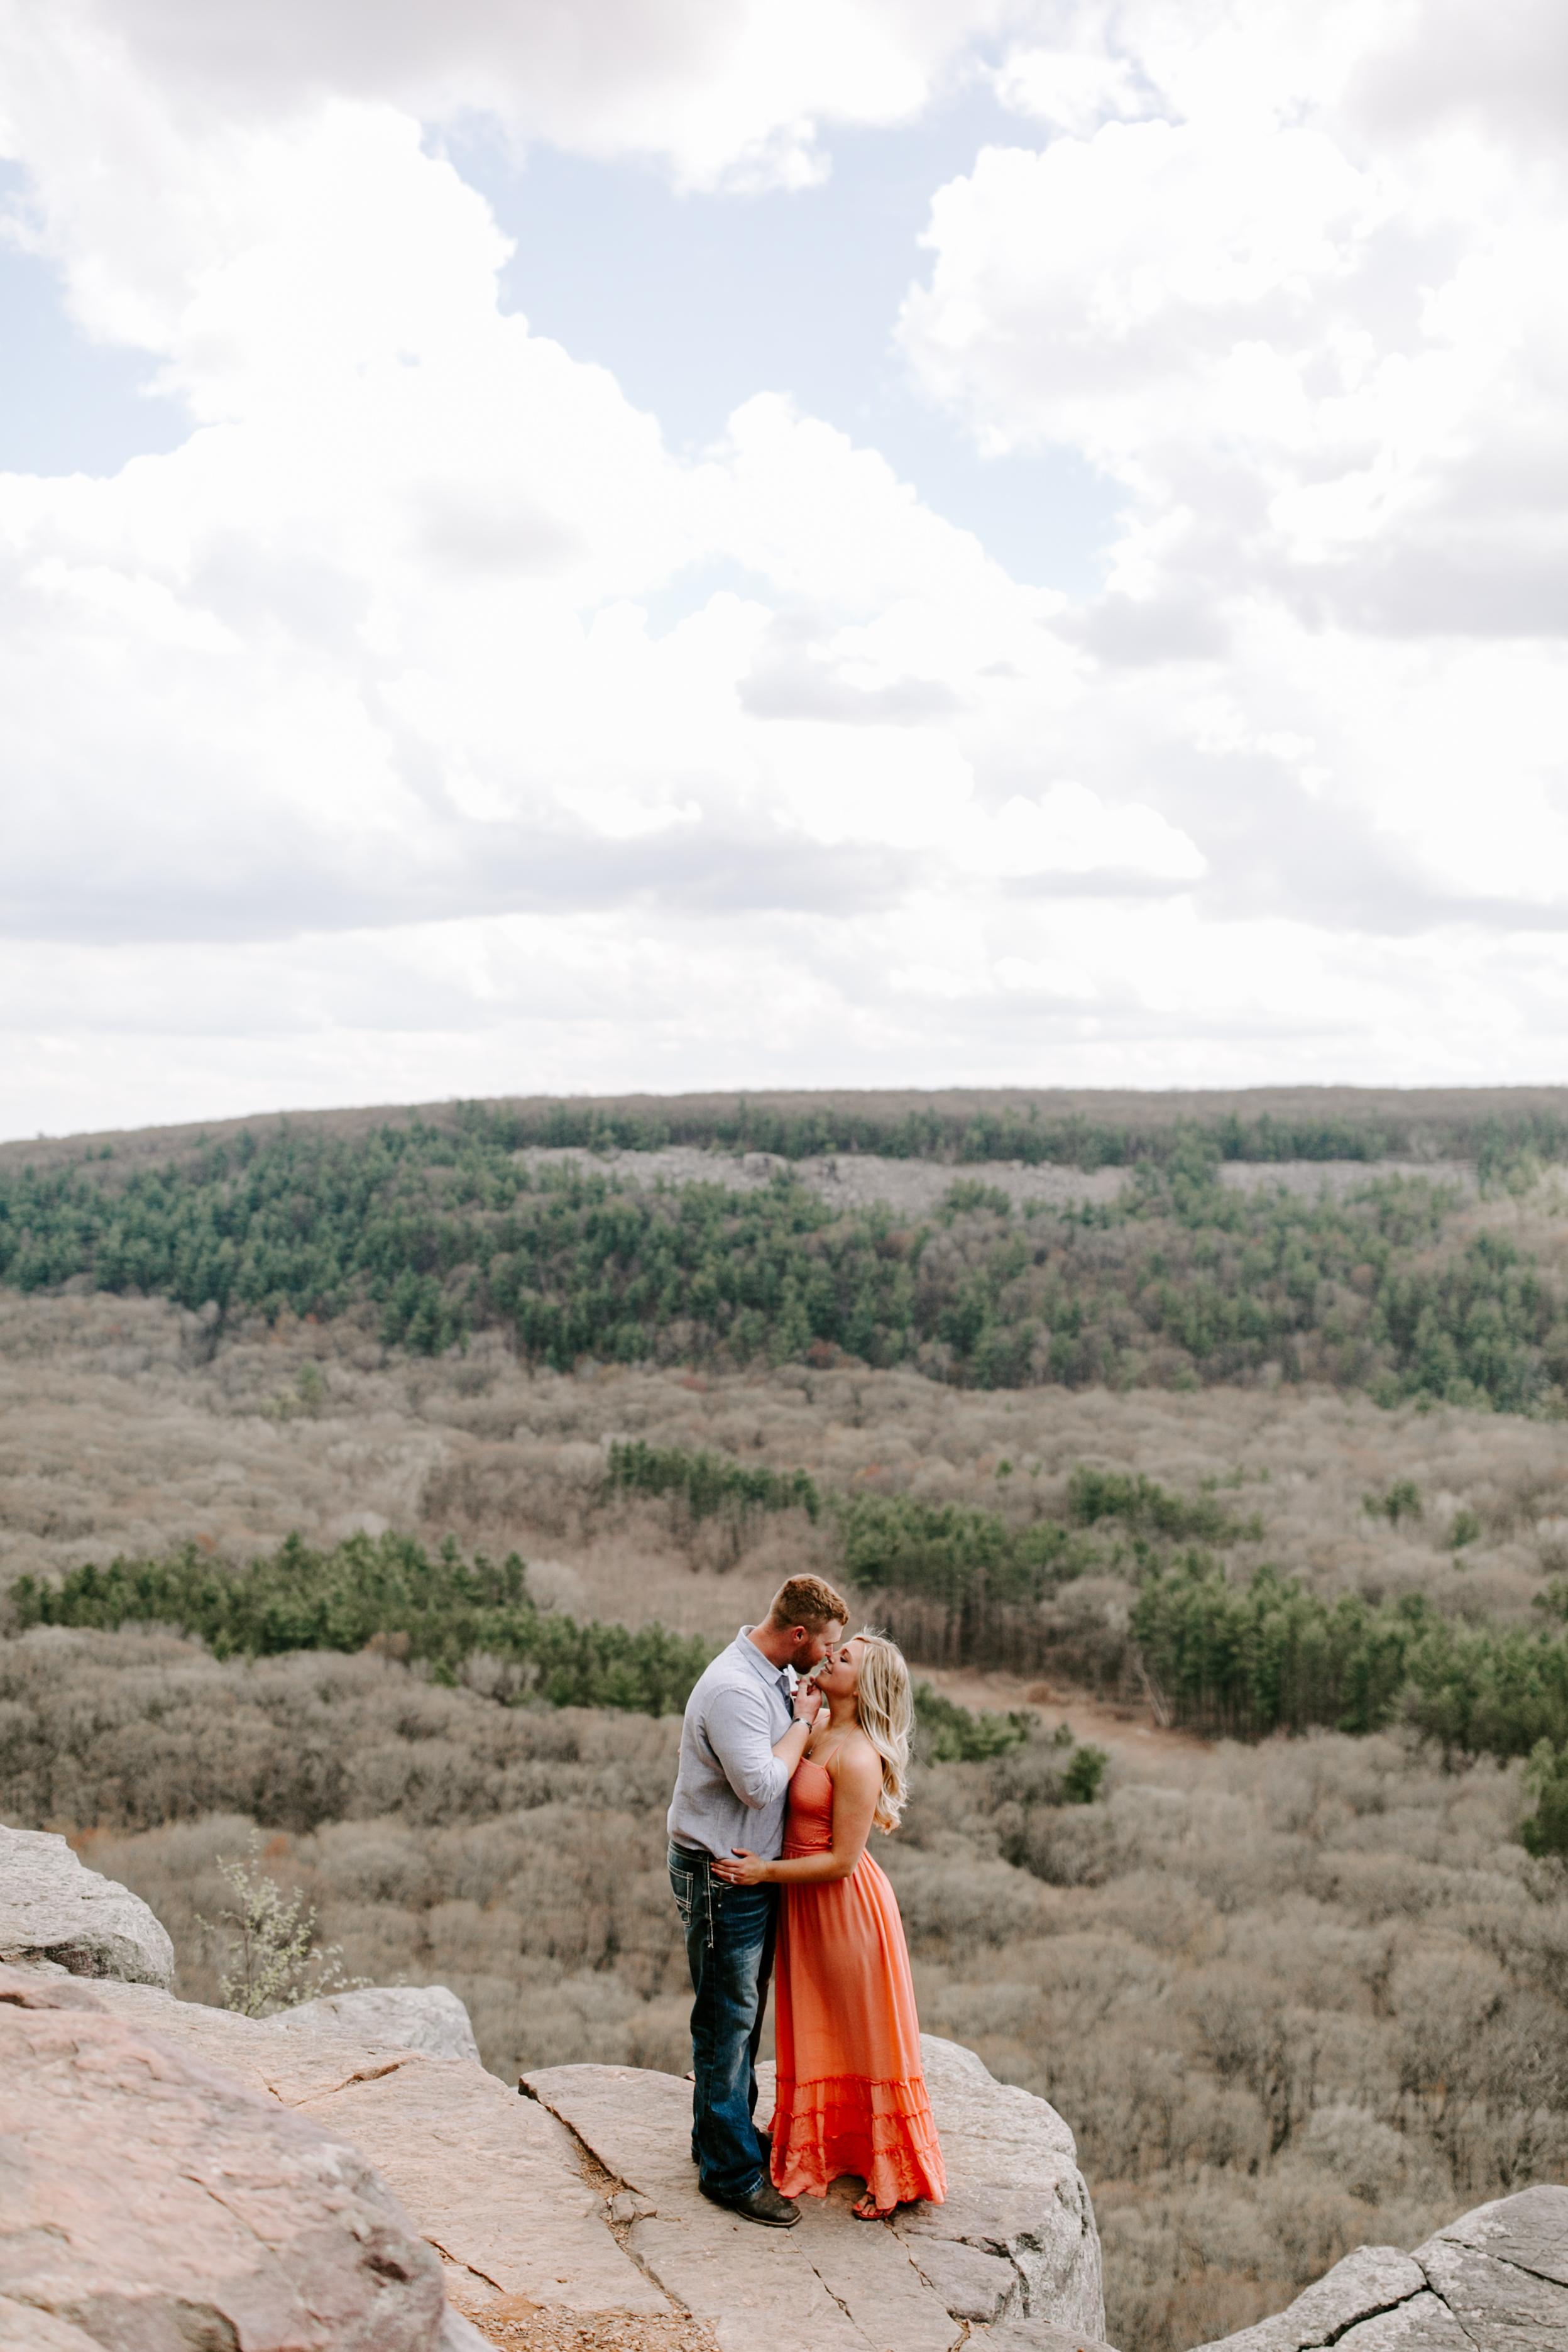 gracetphotography-wedding-photographer-adventure-bride-engagement-13.jpg